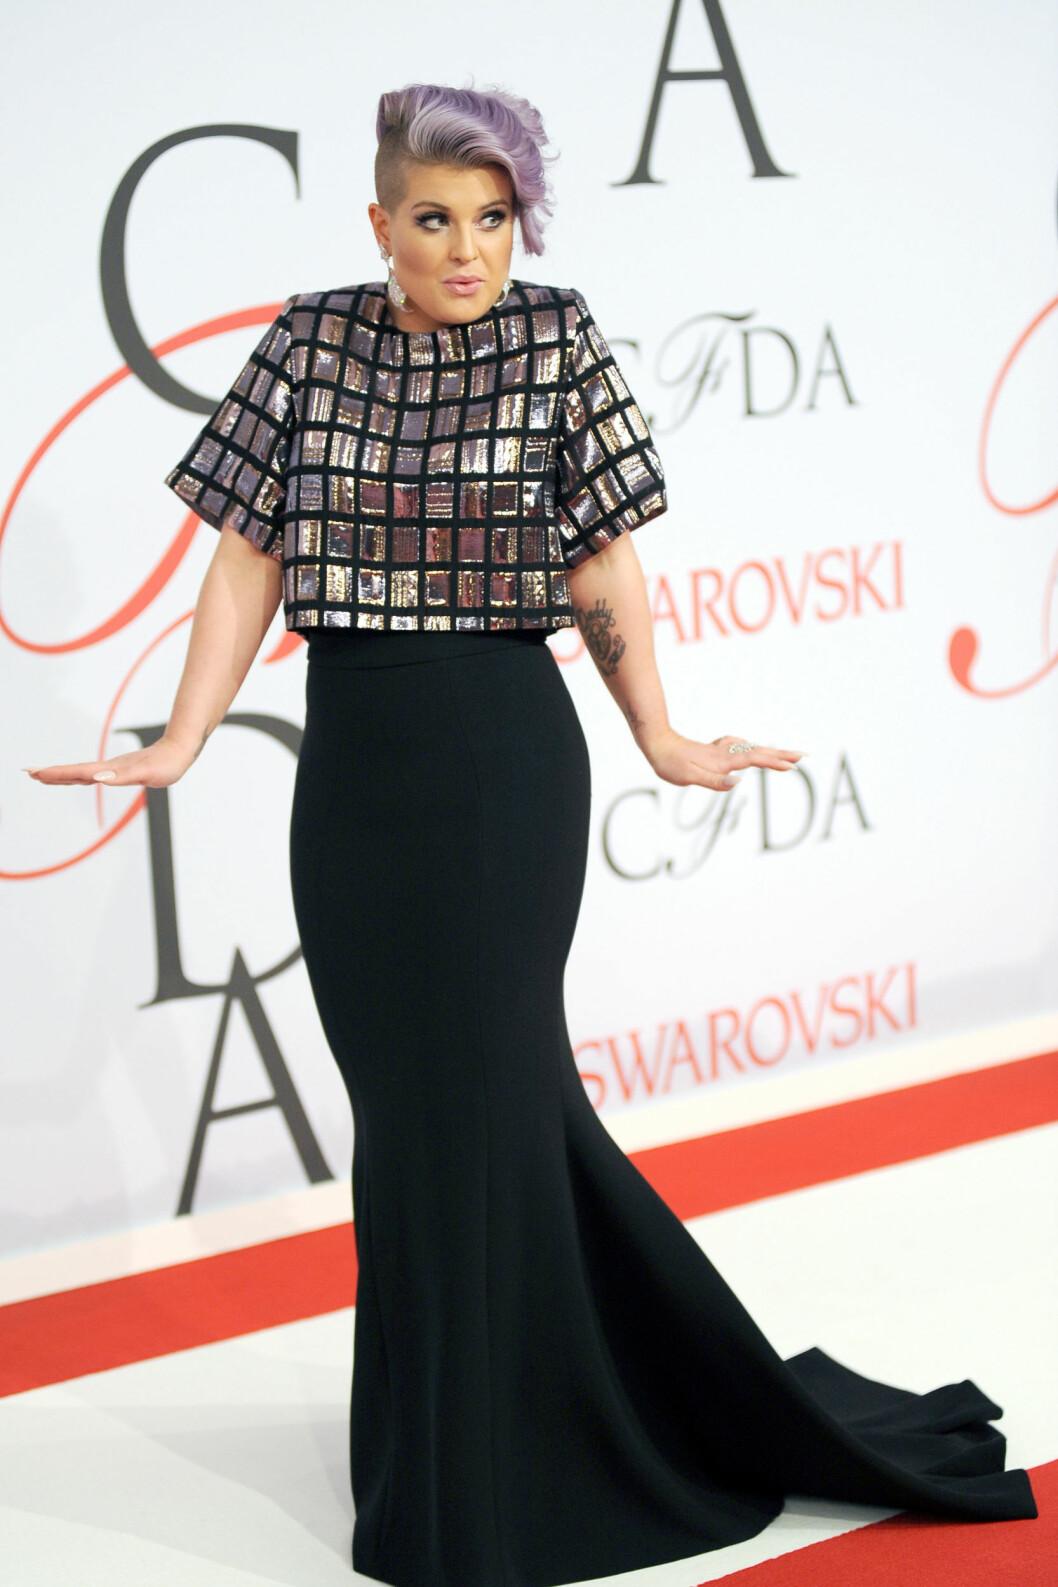 VISTE FORMER: Kelly Osbourne (30). Foto: Zuma Press